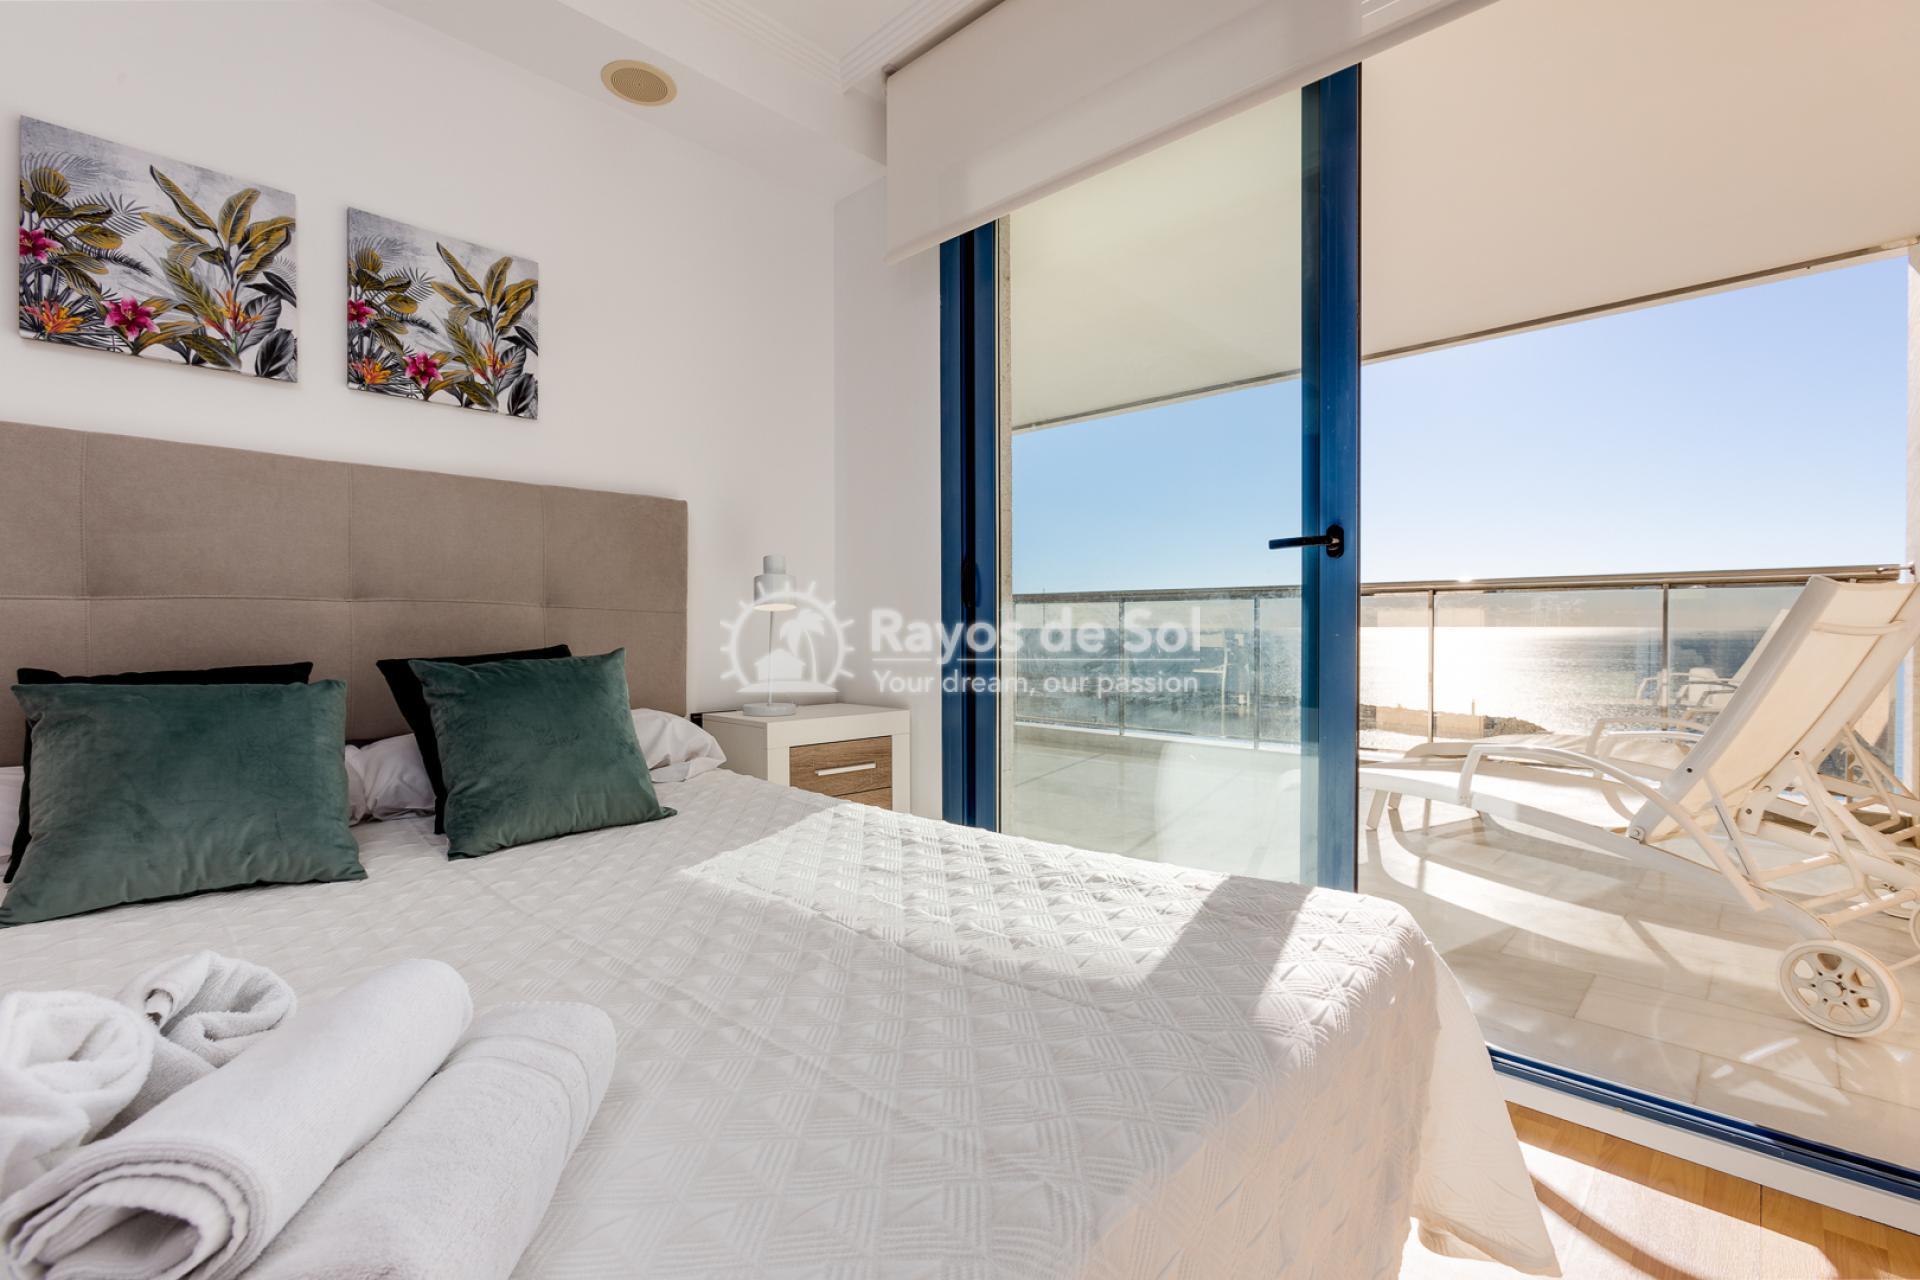 Turnekey first line apartments  in Altea, Costa Blanca (Alteabeach) - 32